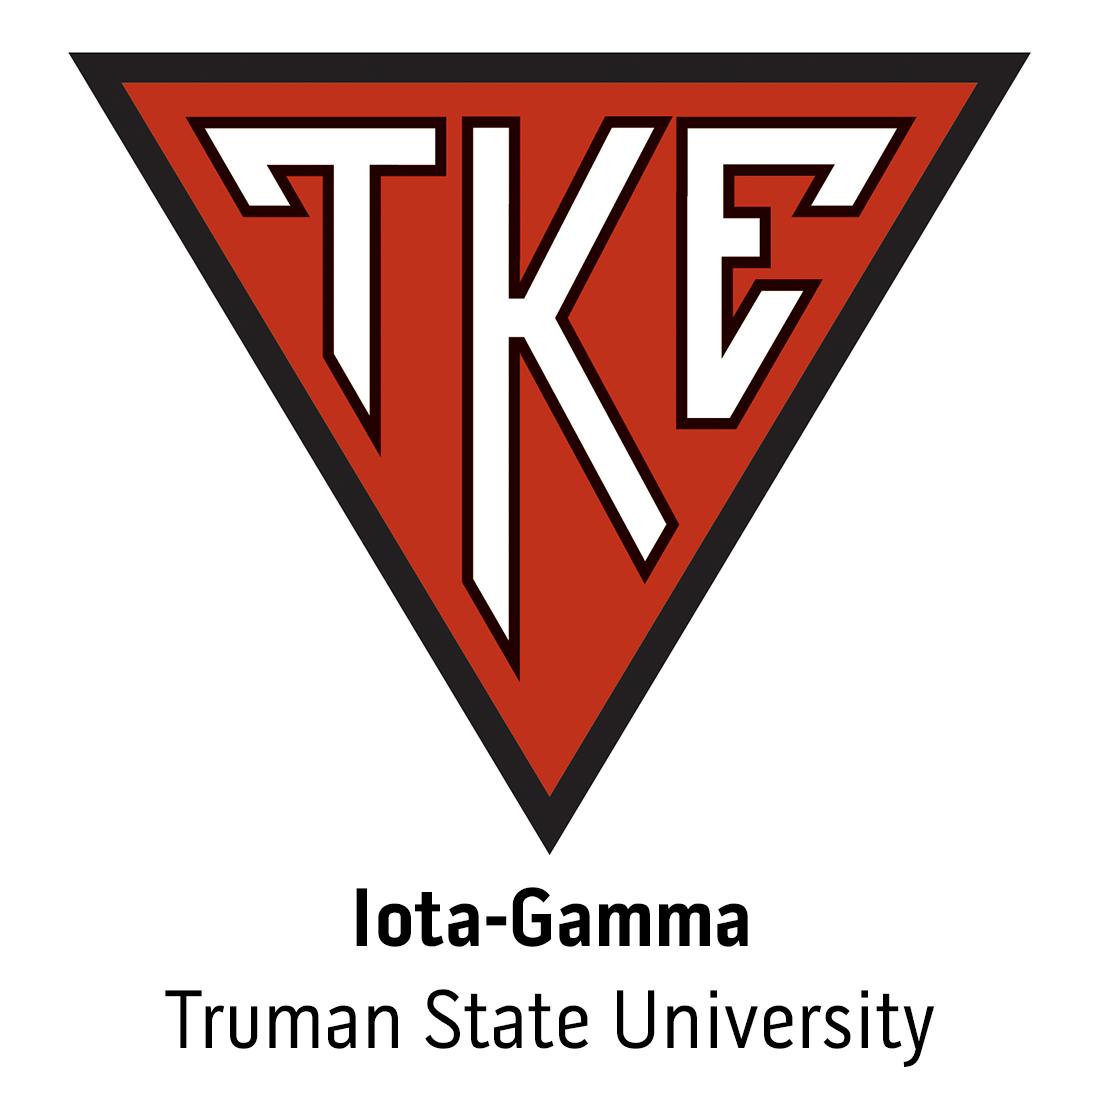 Iota-Gamma Chapter at Truman State University